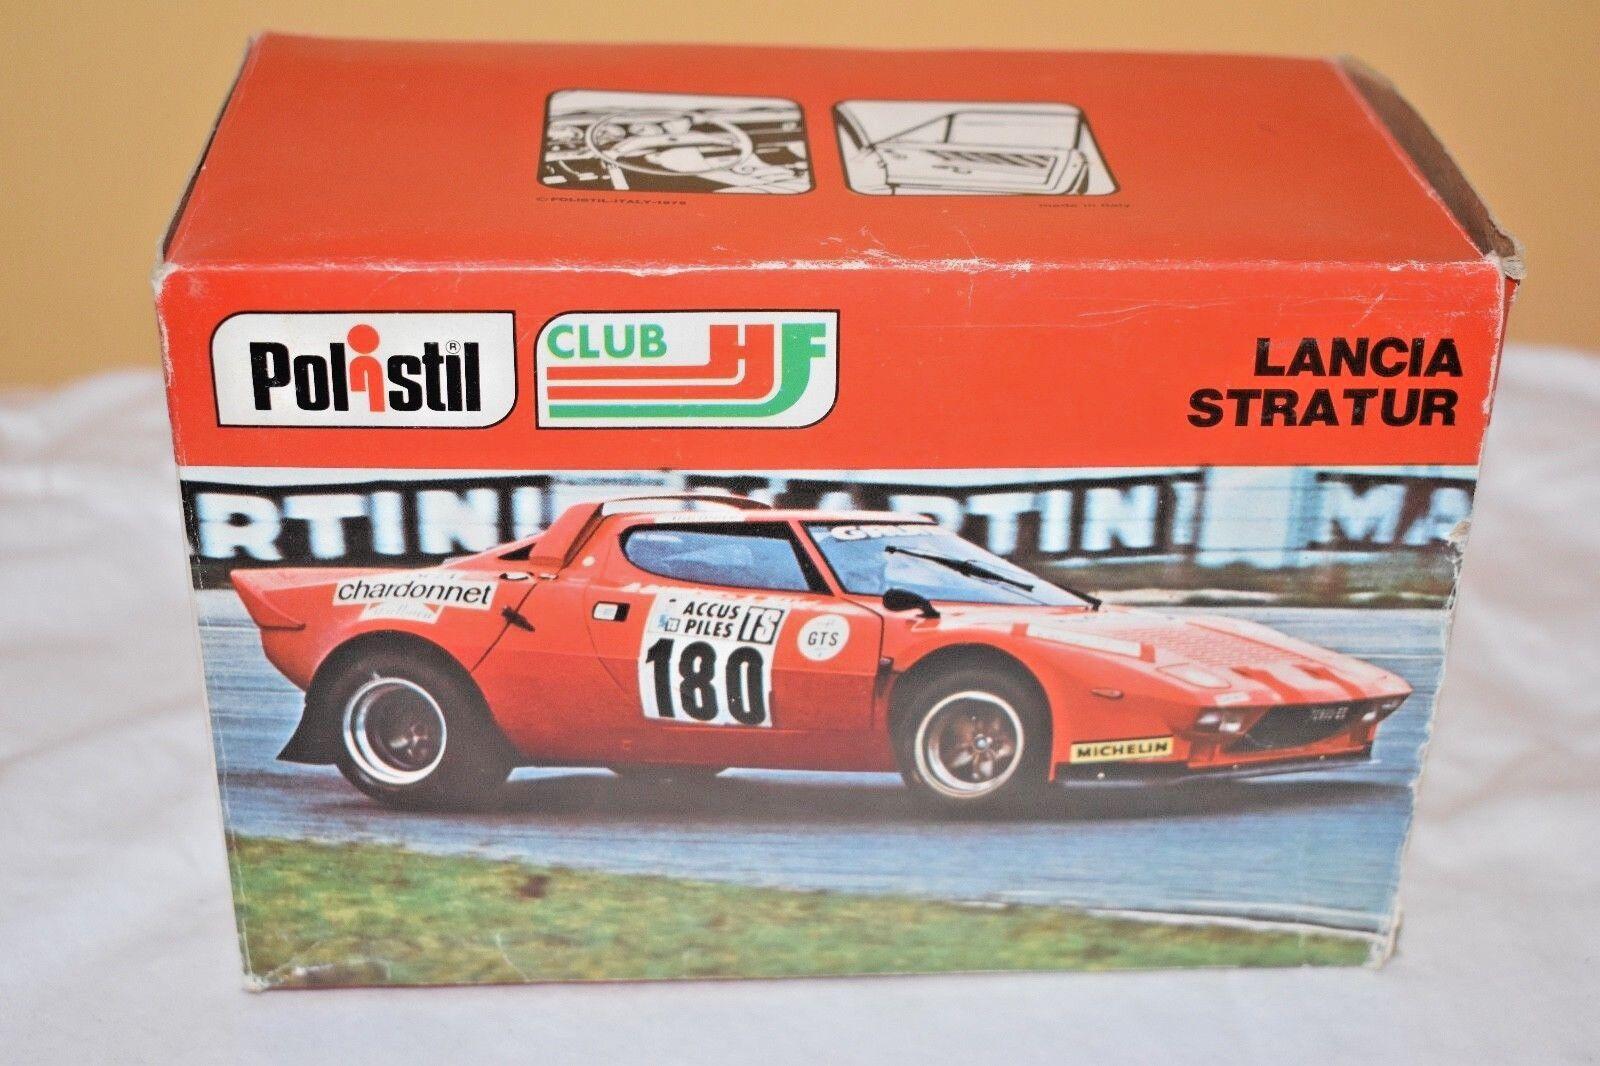 S32; Polisti Stratur Modello Lancia Die Cast; yf7b6g